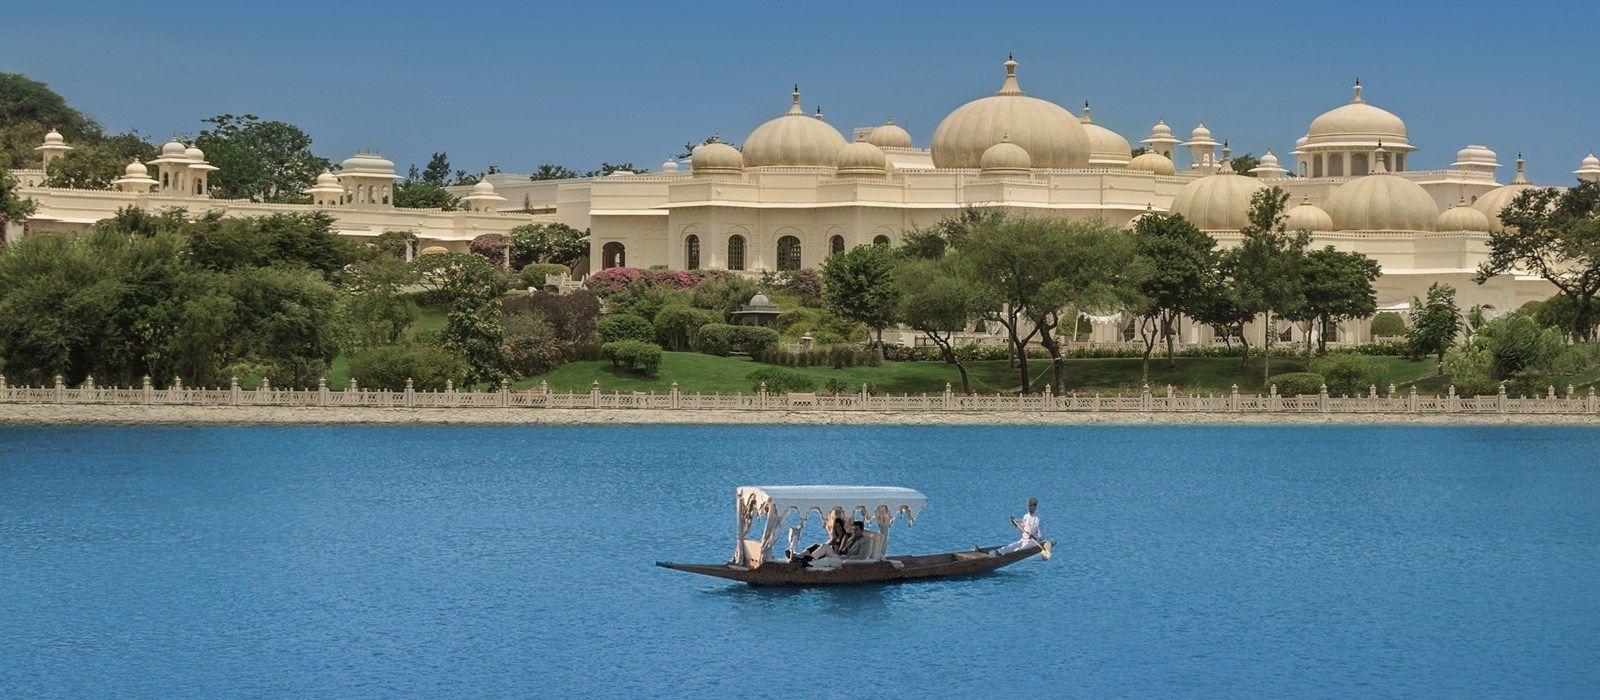 Oberoi Exklusiv: Royales Rajasthan und Safari Abenteuer Urlaub 7